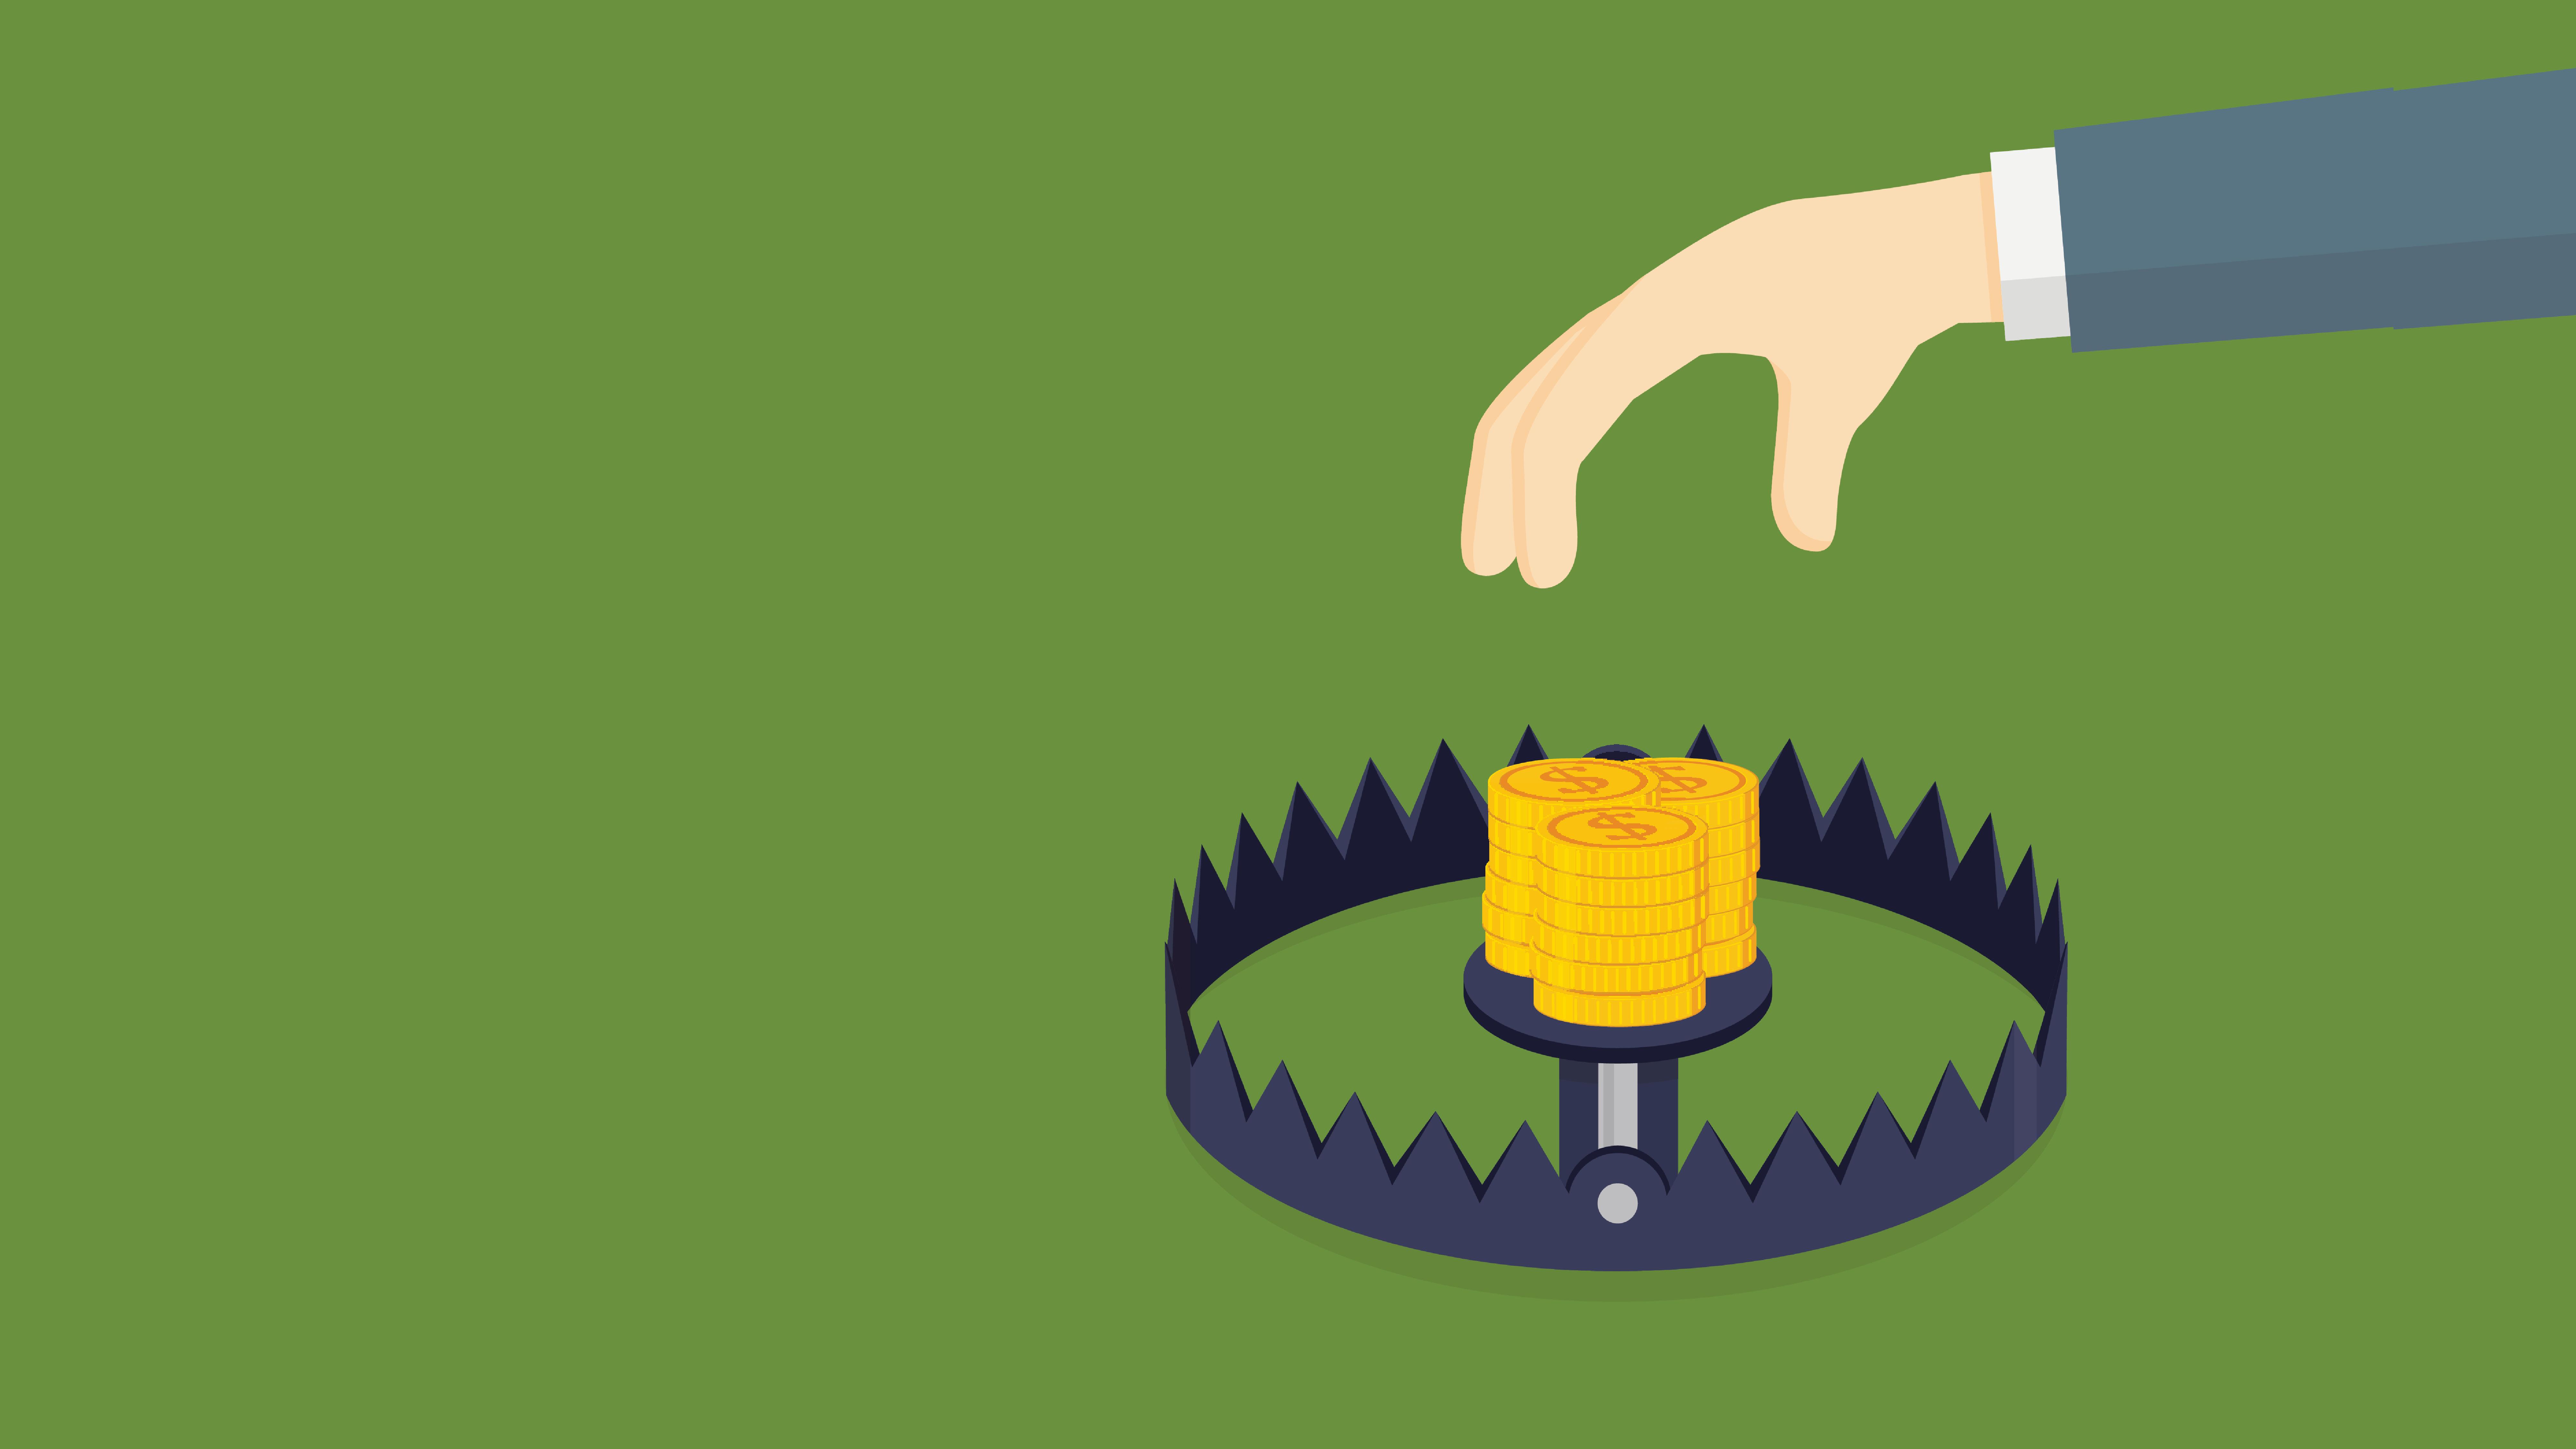 Beware the (fair market) value trap